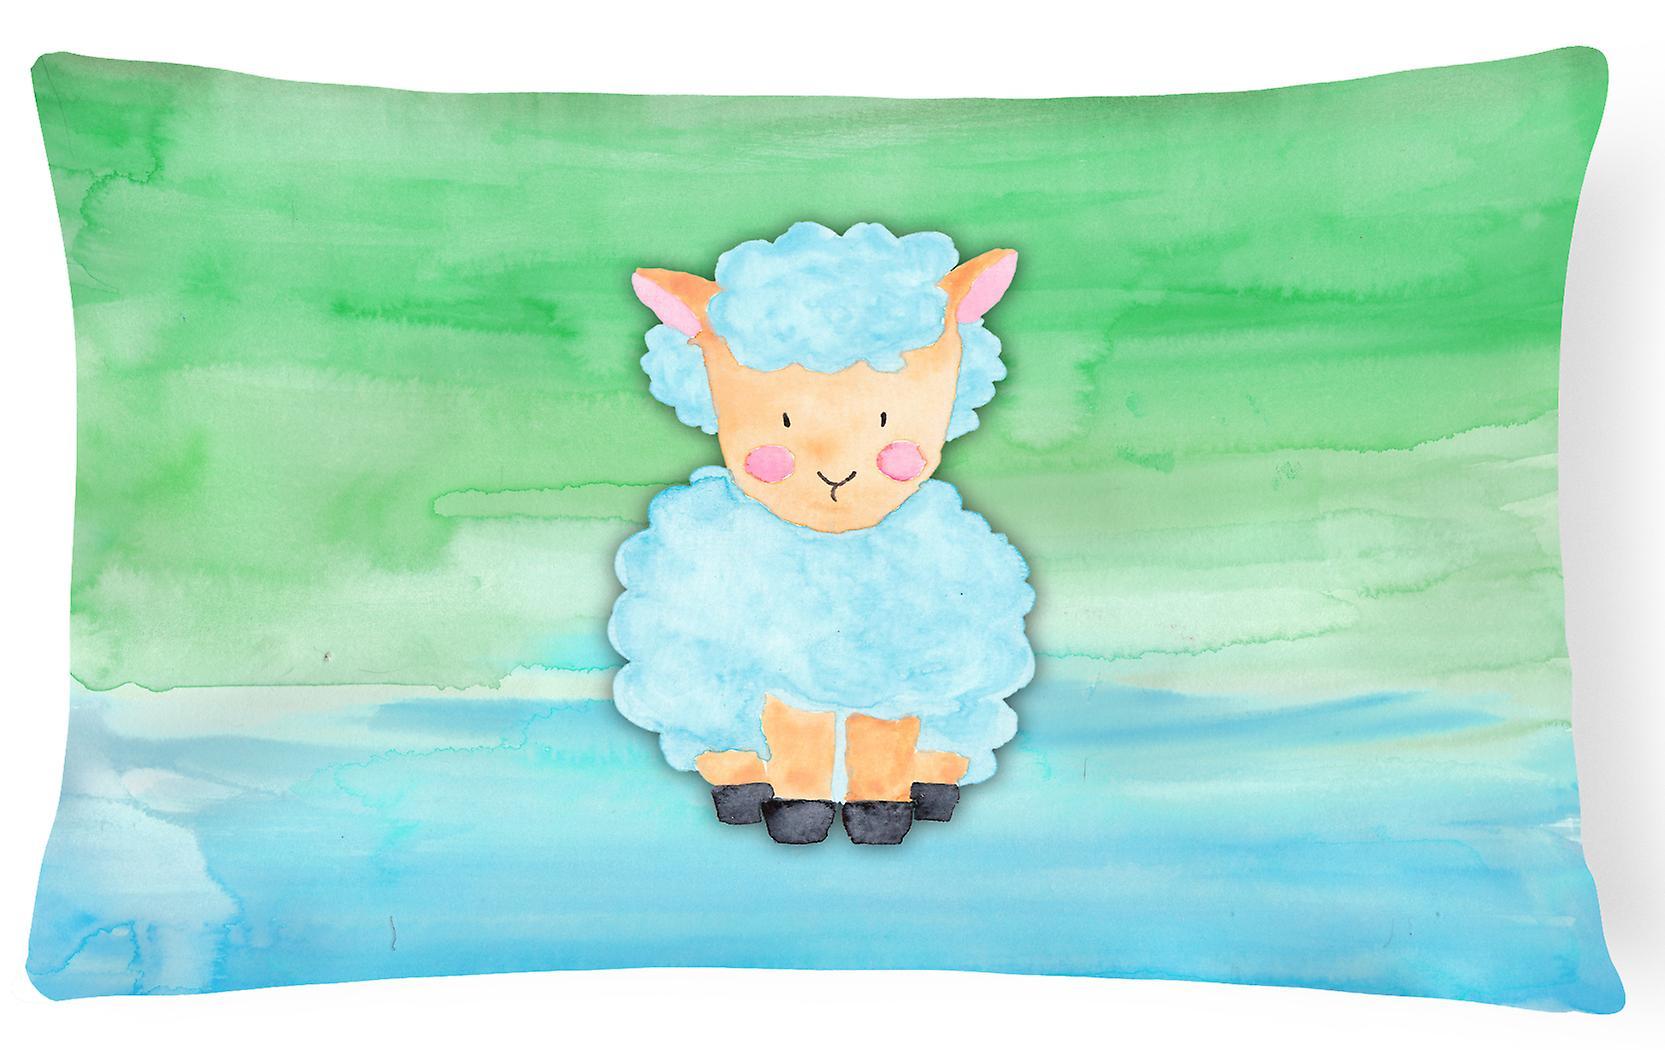 Agneau Décoratif Mouton Aquarelle Tissu Toile Oreiller 6YfyIbgv7